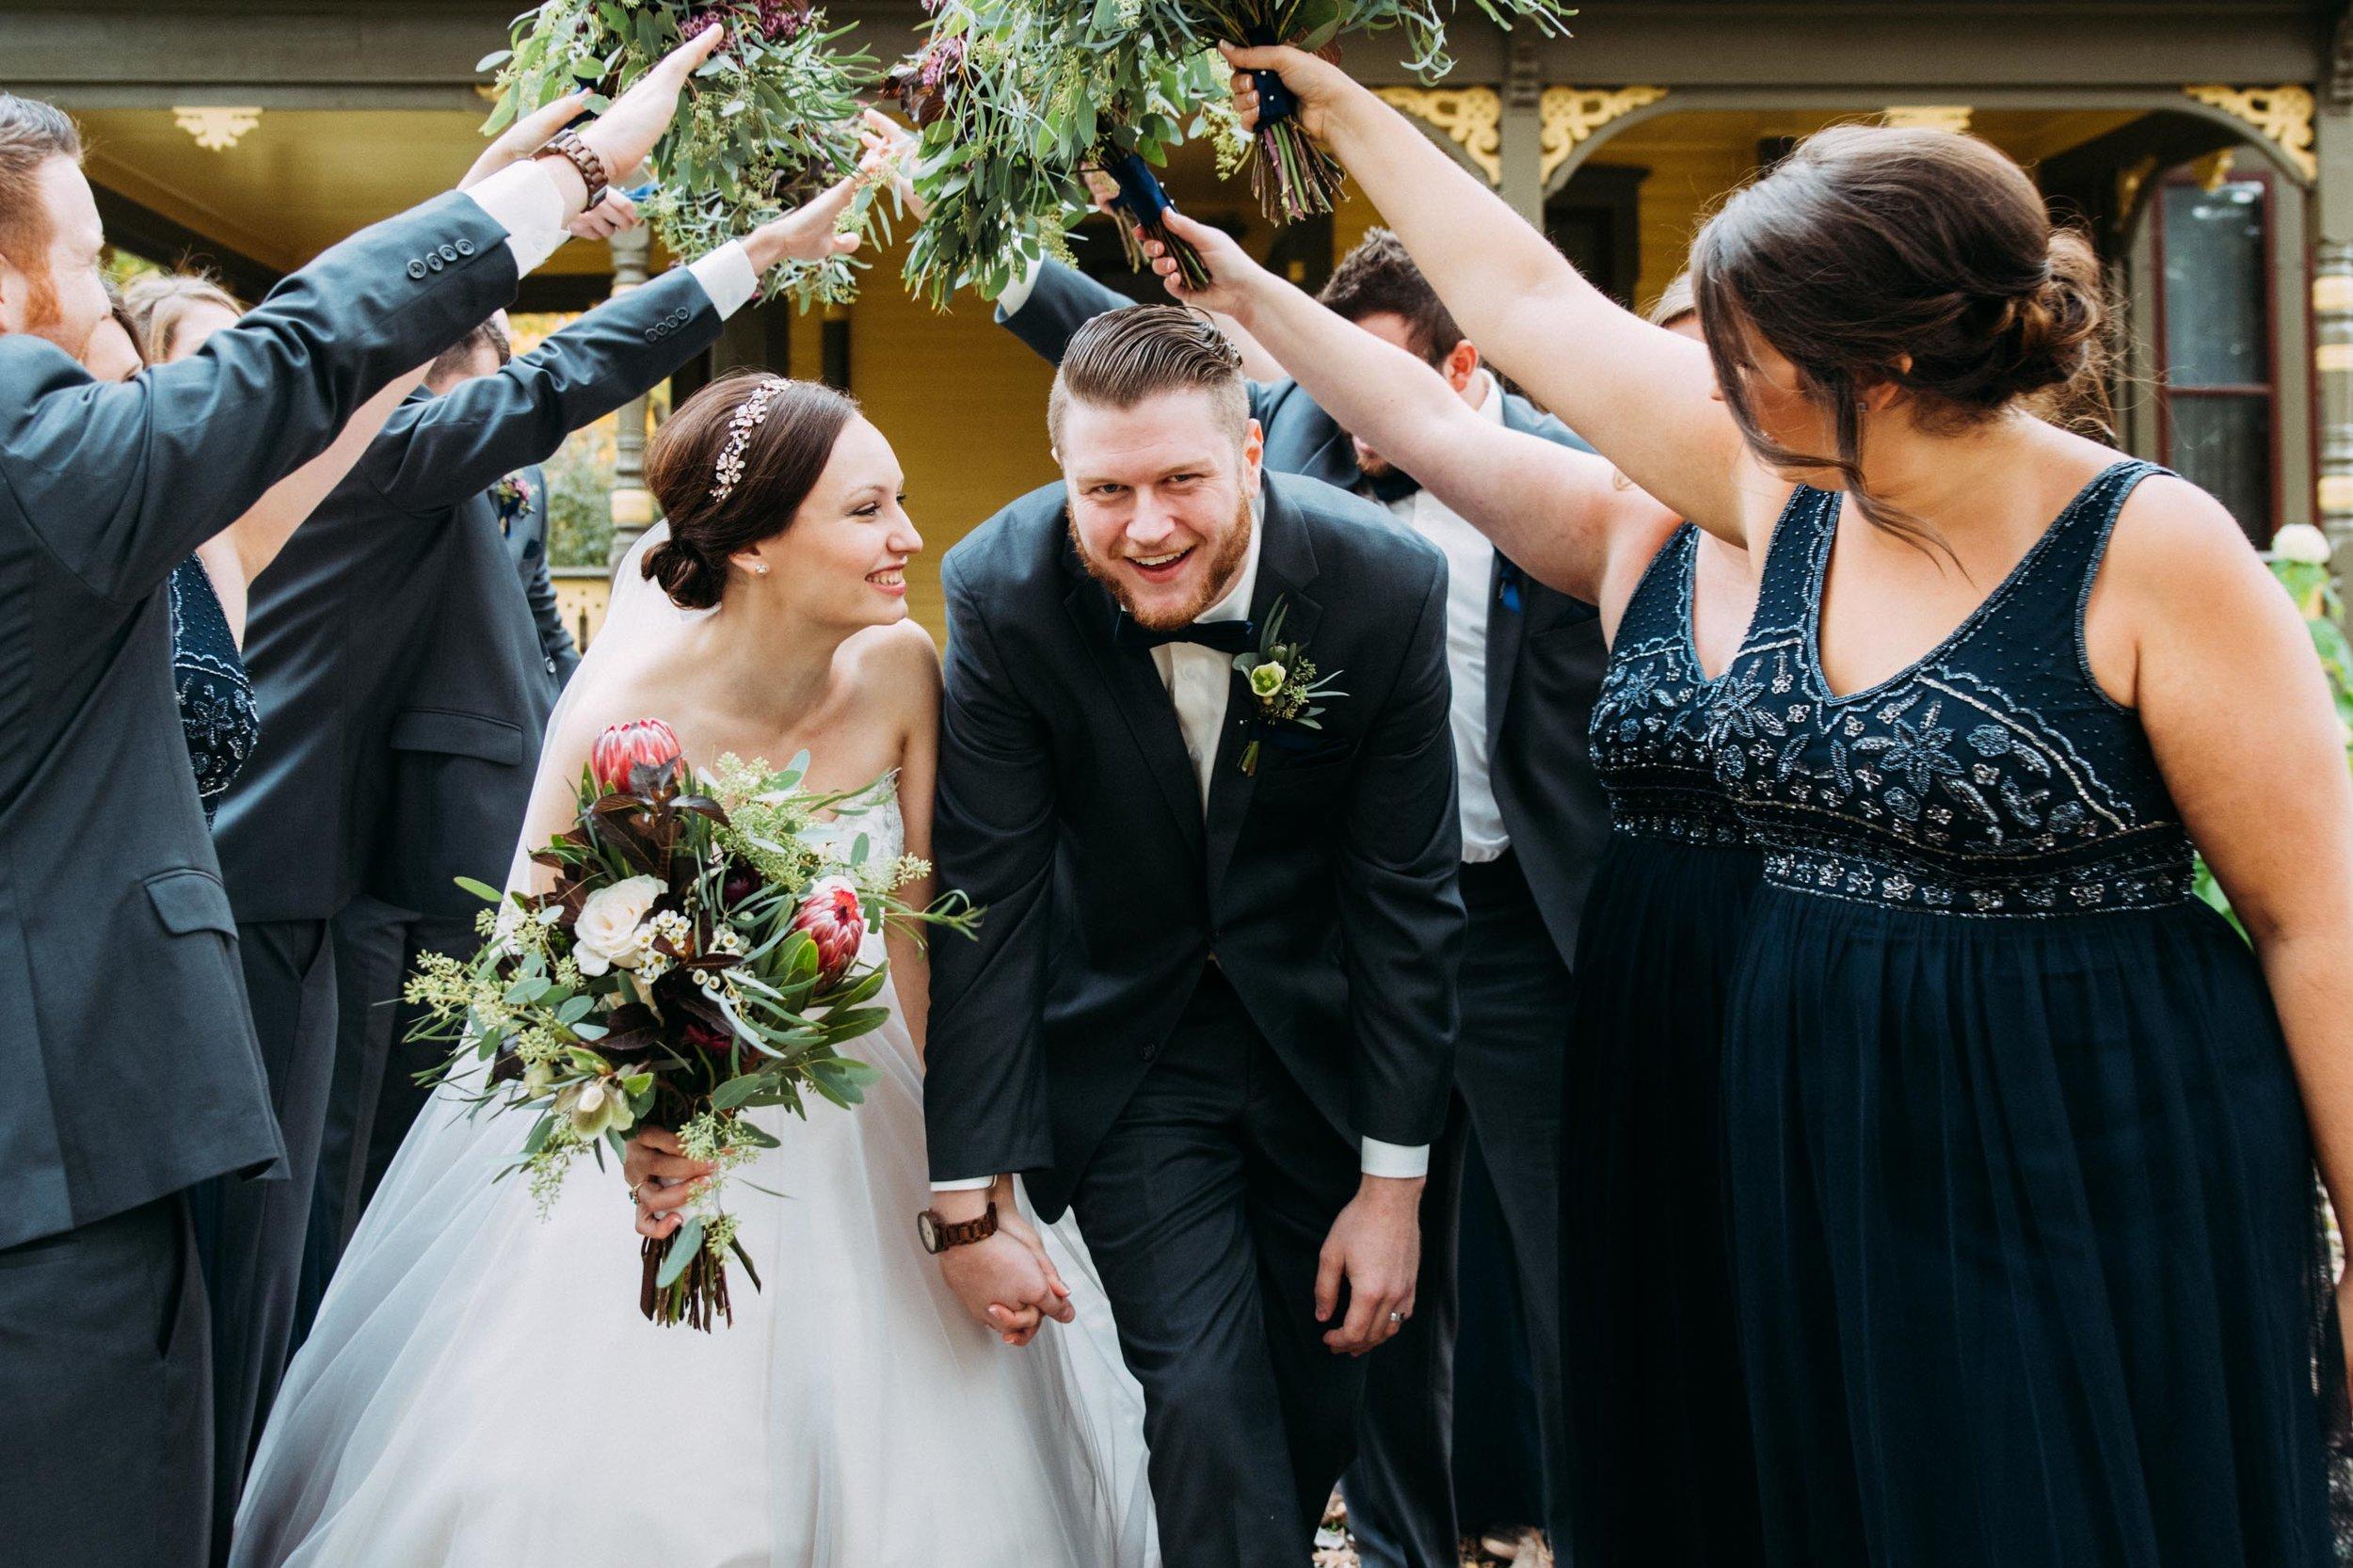 20-Sara_Tom_Wedding_Party_Portraits_Minneapolis_Wedding.jpg